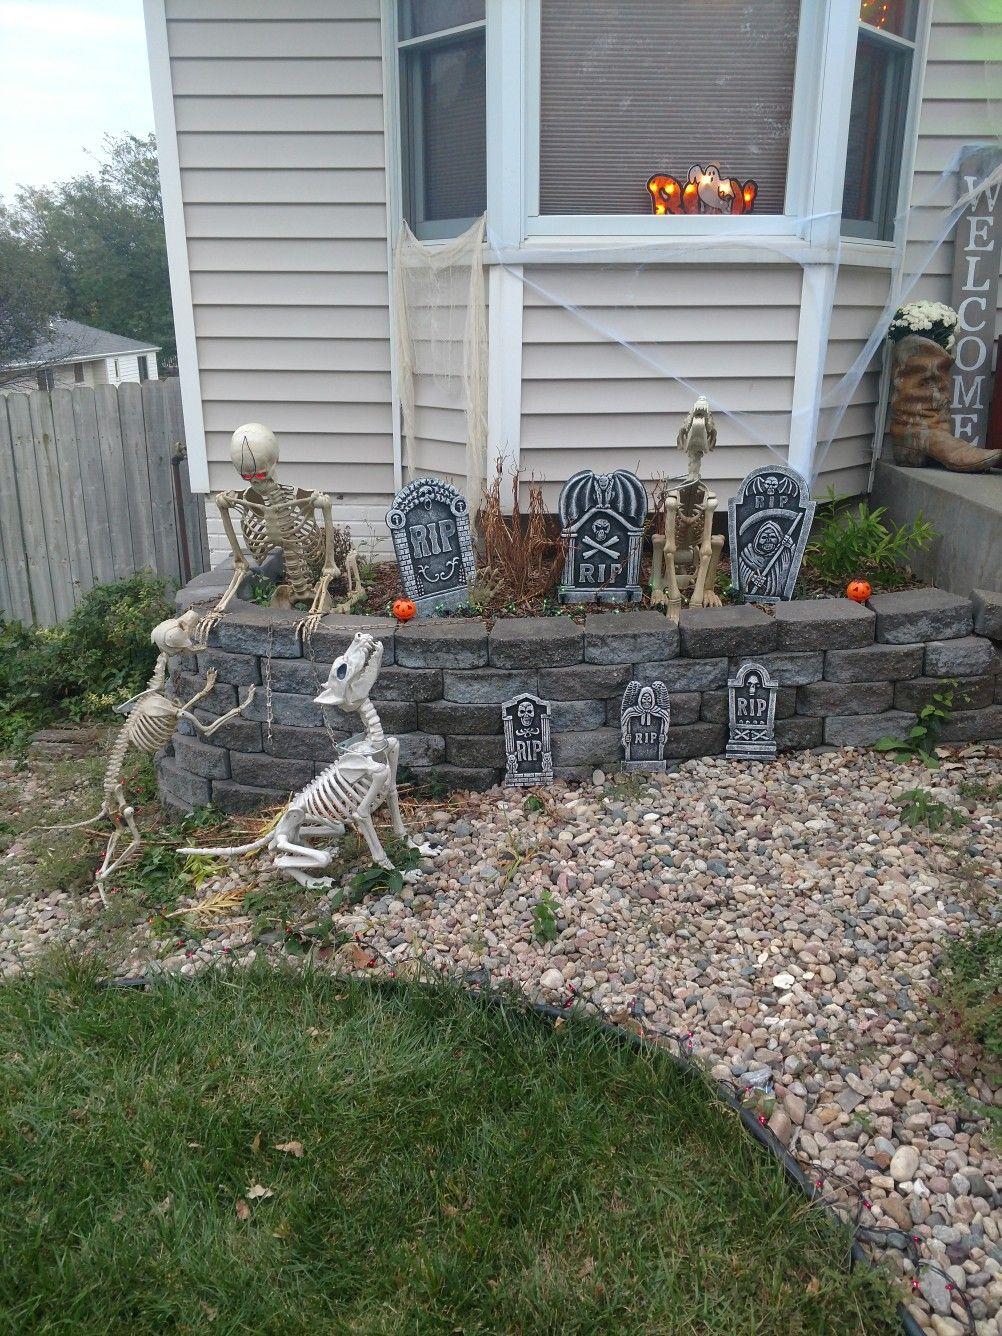 pet cemetery. skeleton. dog skeleton. halloween decorations